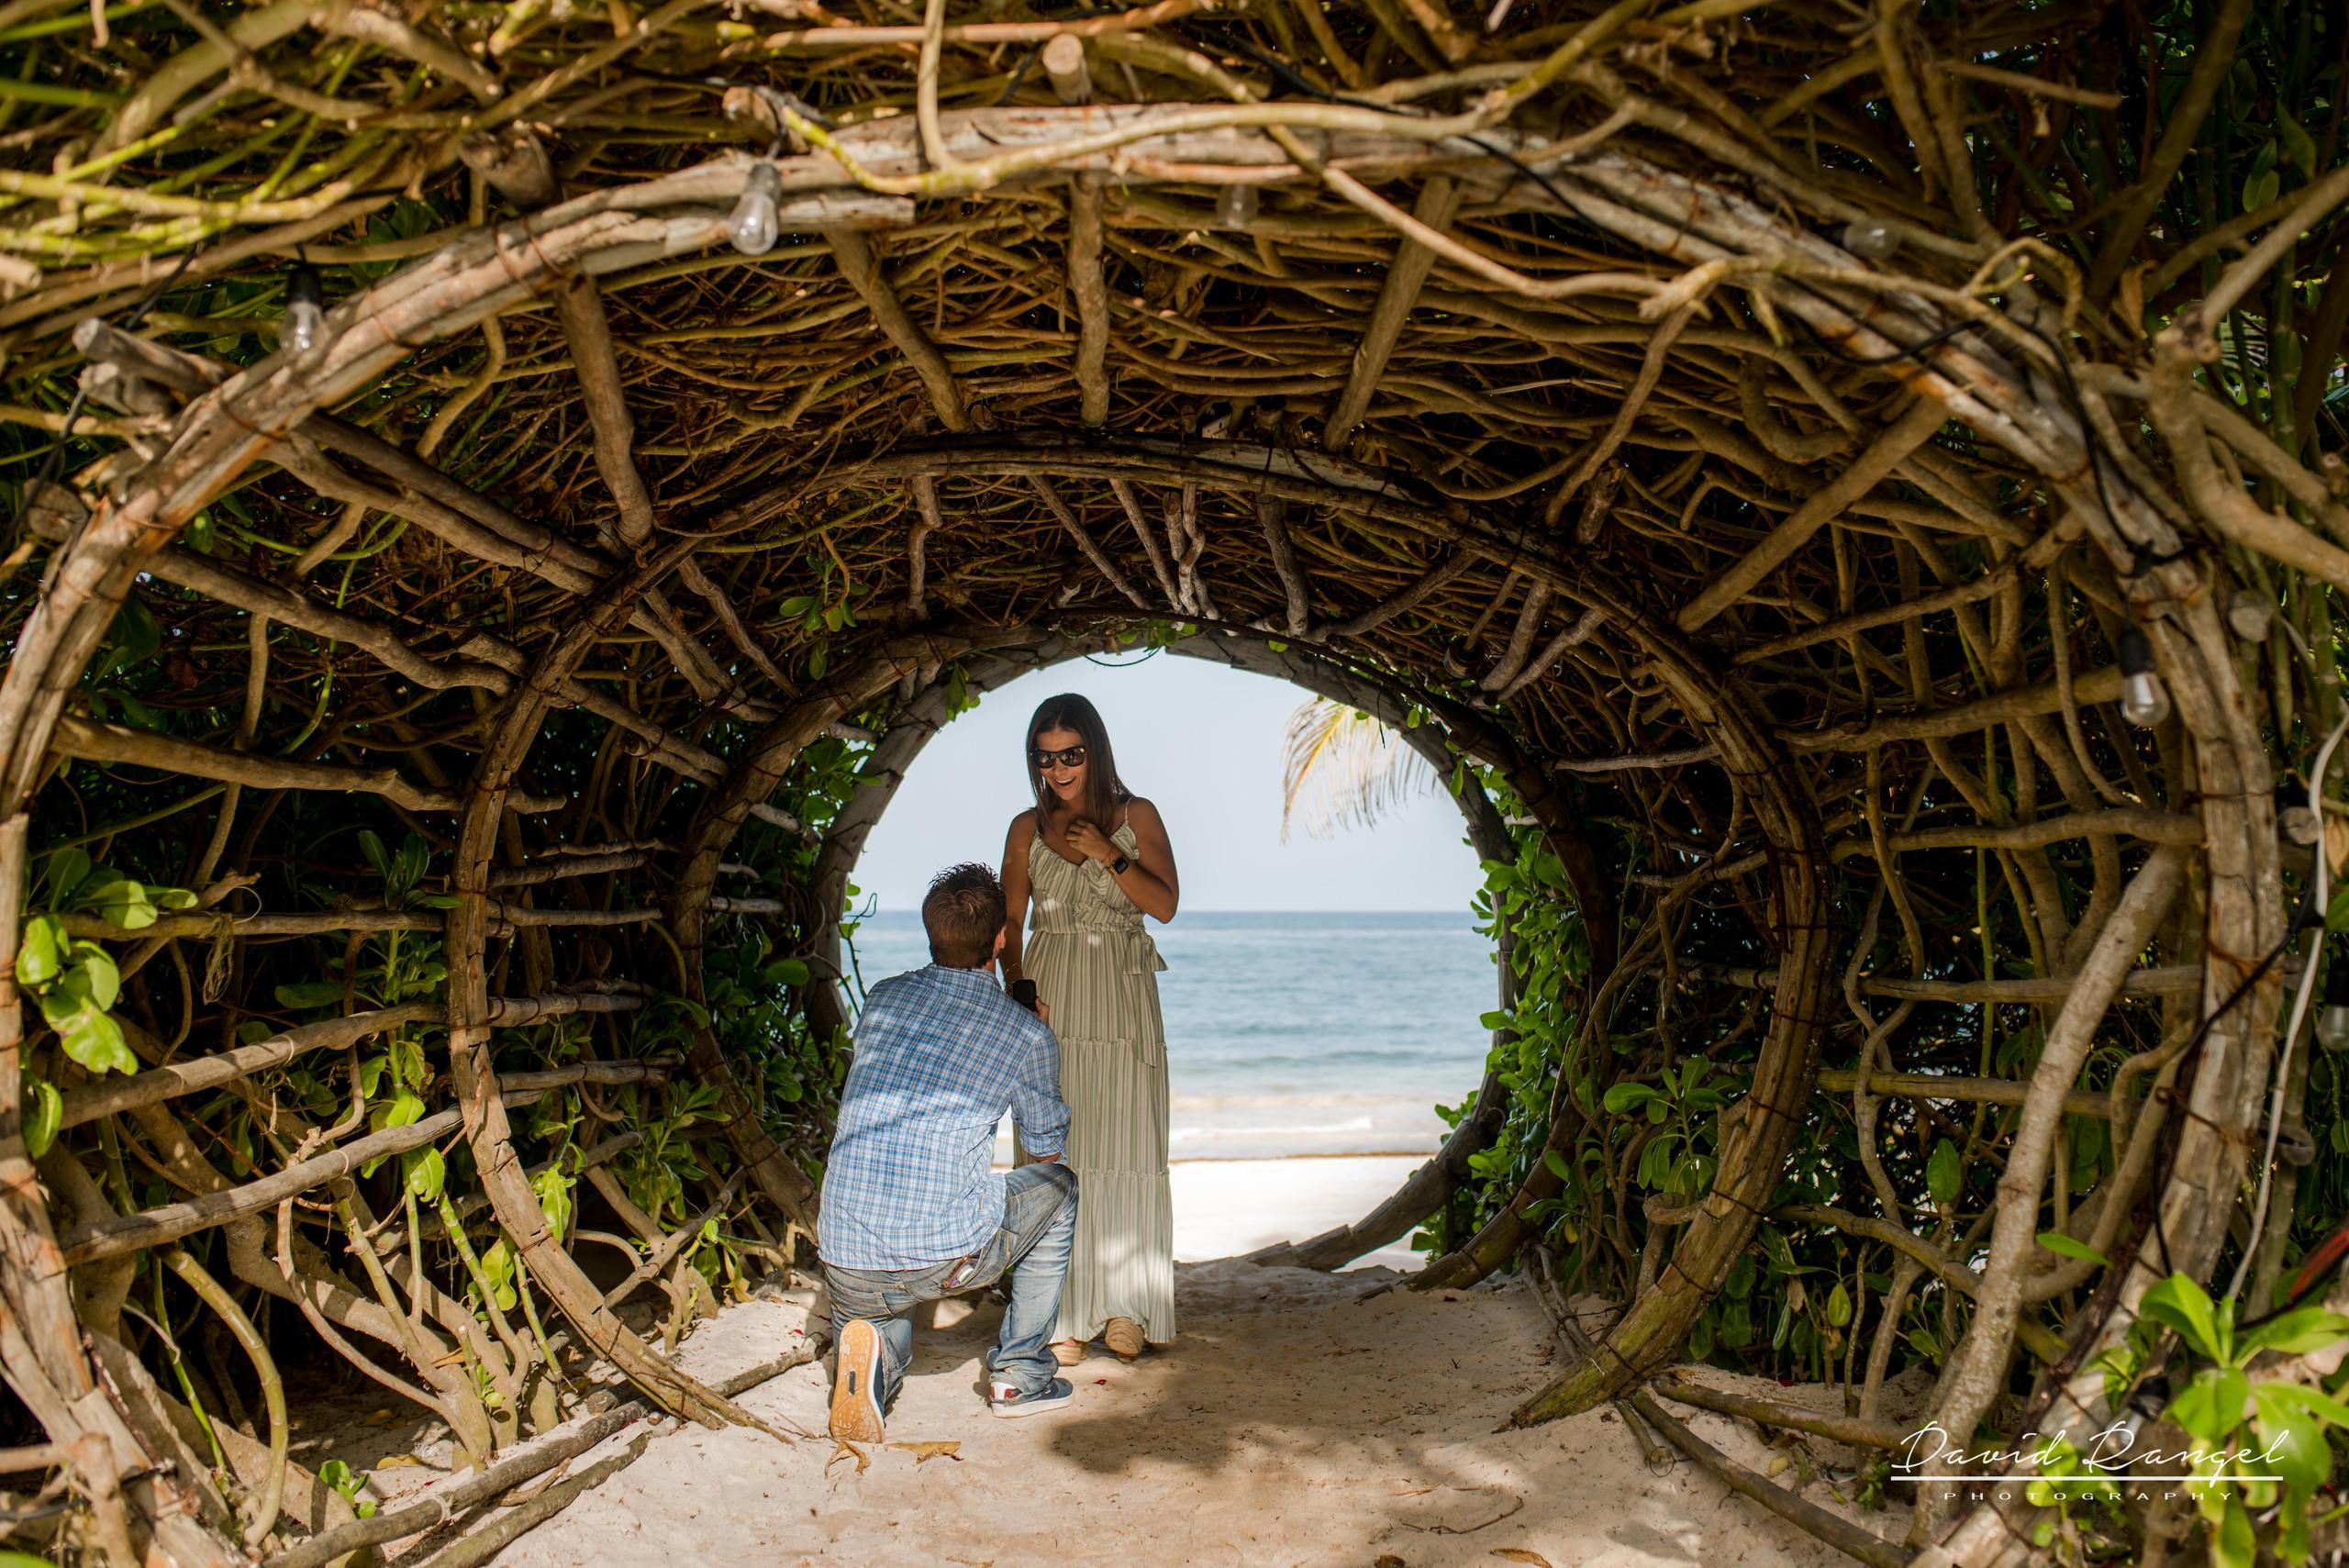 engagement+session+ring+sorprise+beach+vacations+casa+malca+hotel+pedida+de+mano+propuesta+de+matrimonio+pareja+amor+photo+boutique